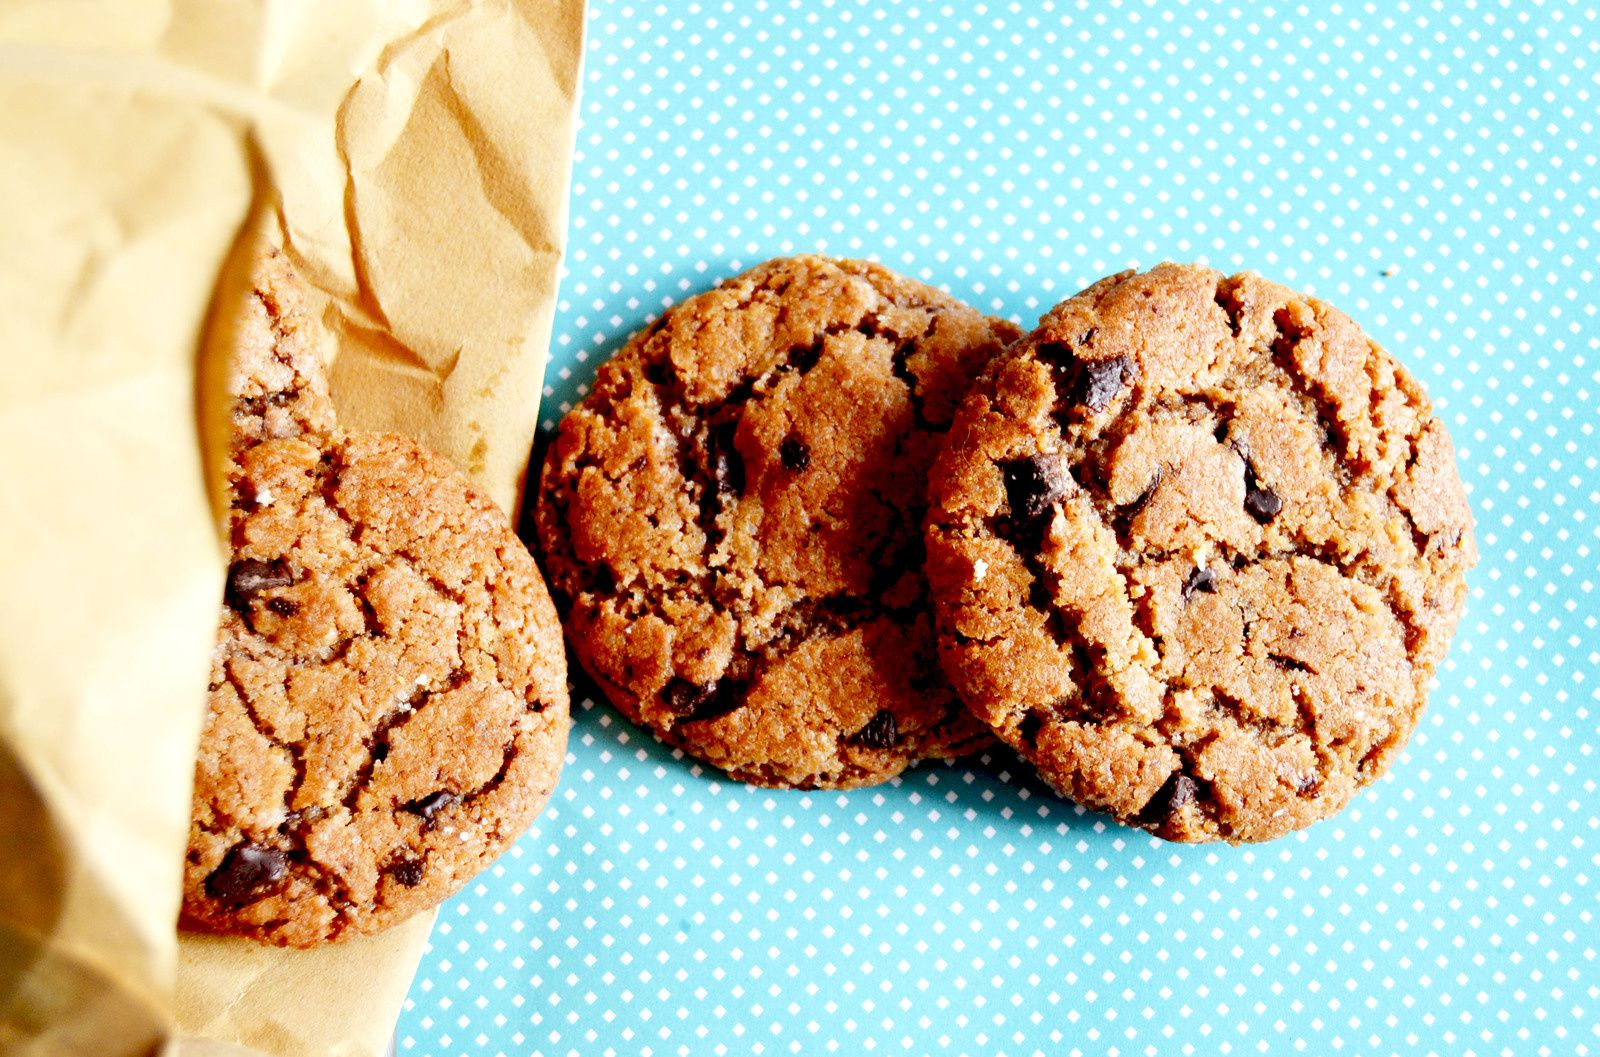 Cookies 100% choco = nutella &amp&#x3B; pépite choco